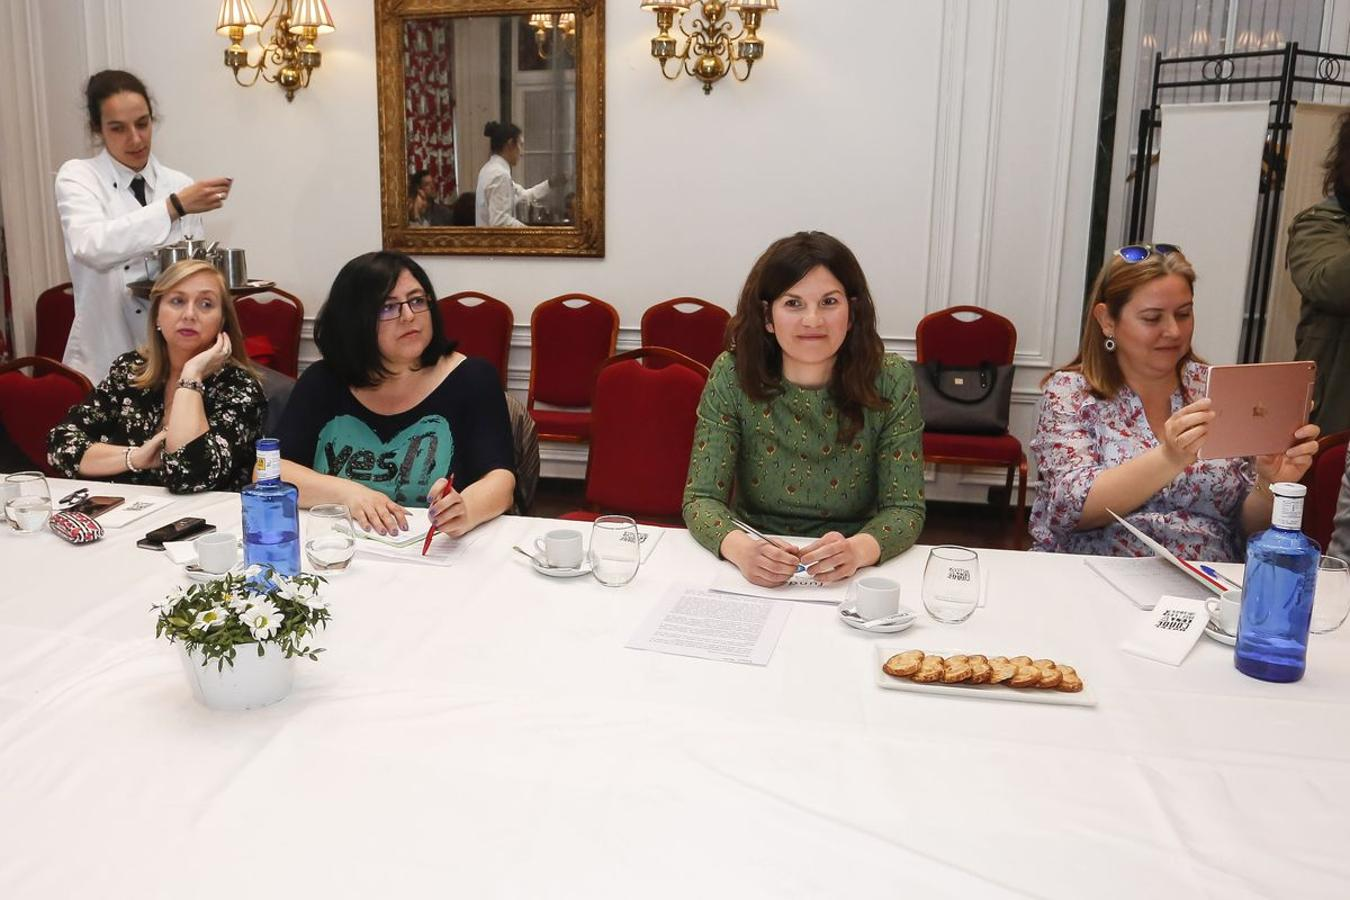 Estreno del proyecto Café Alzheimer en León